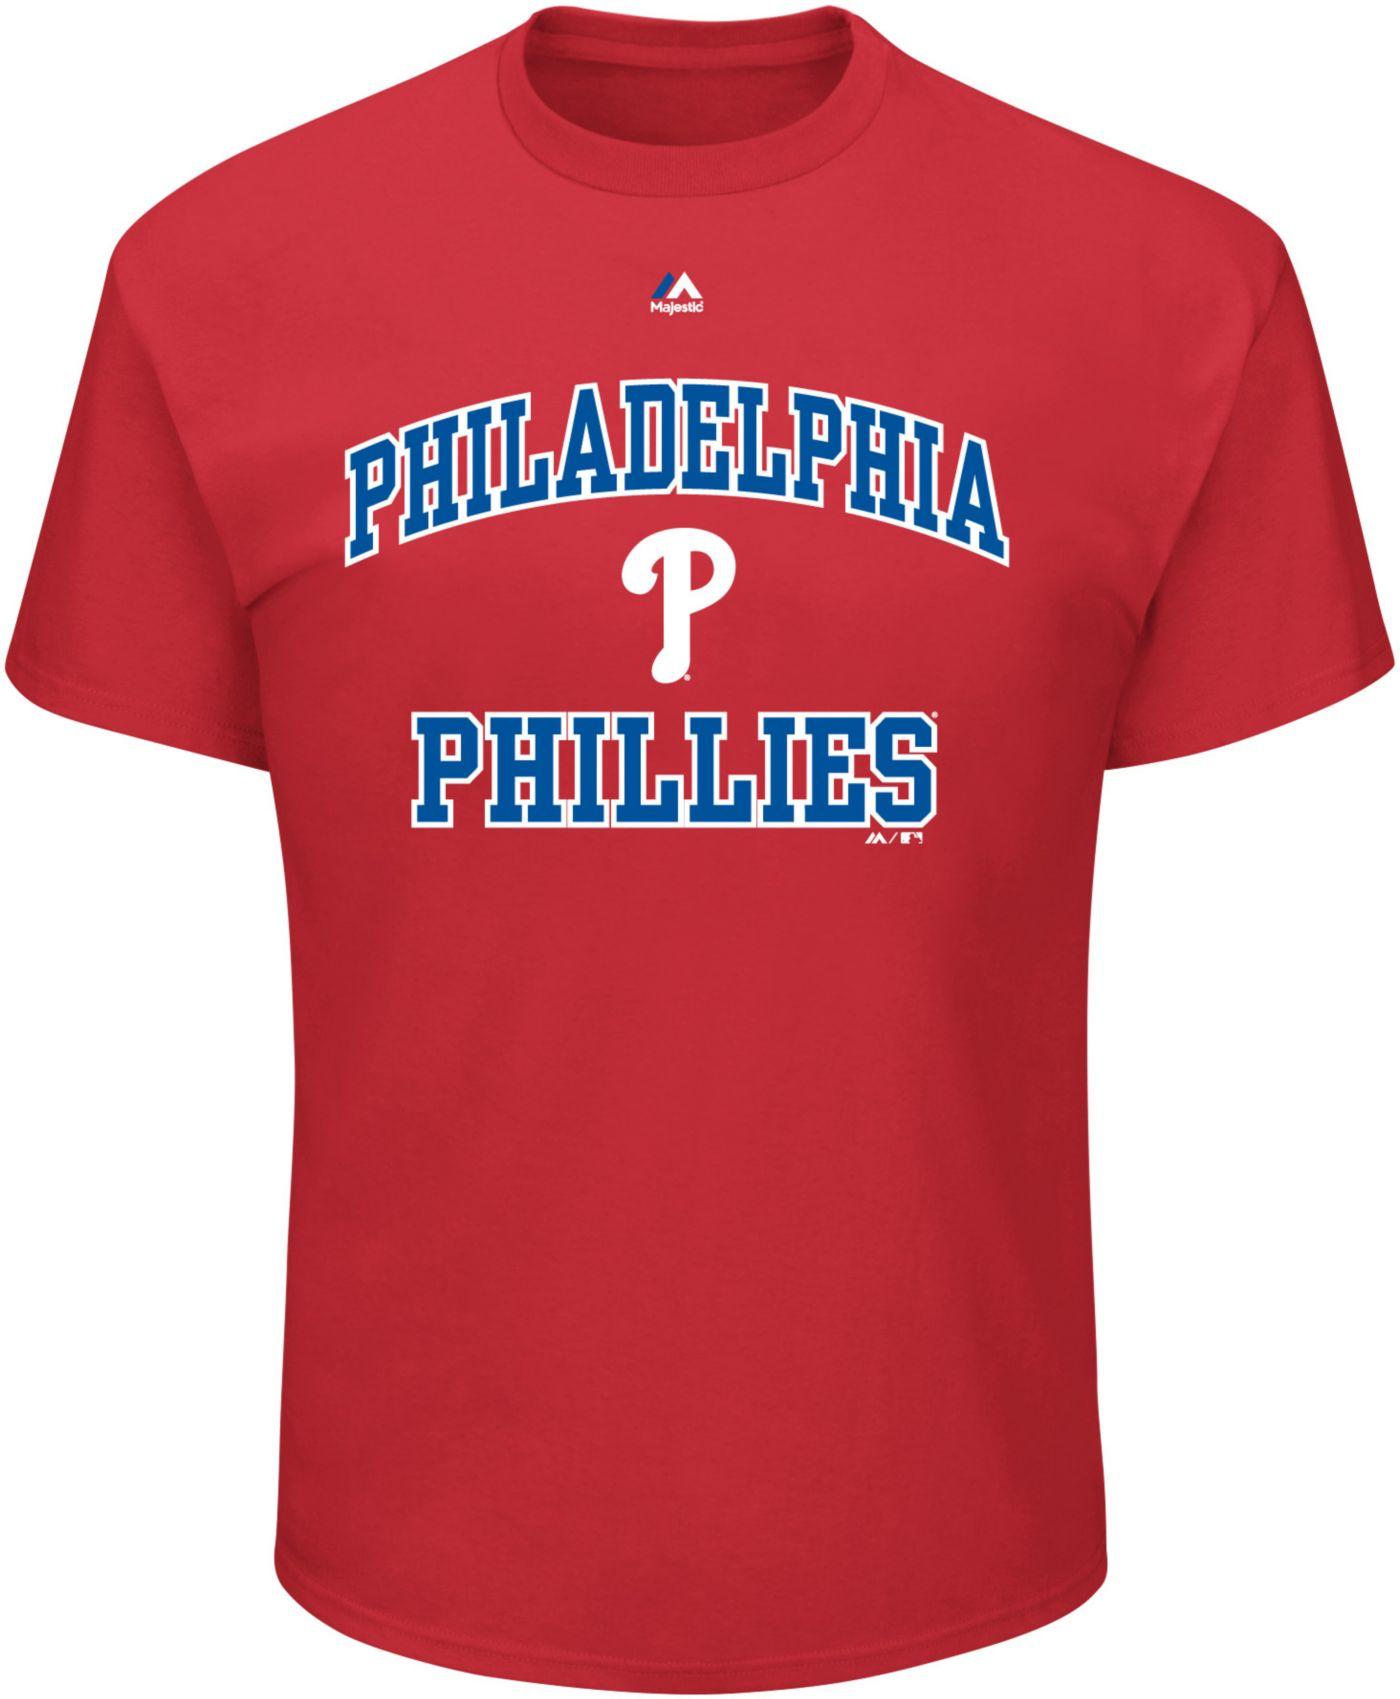 Majestic Men's Philadelphia Phillies T-Shirt